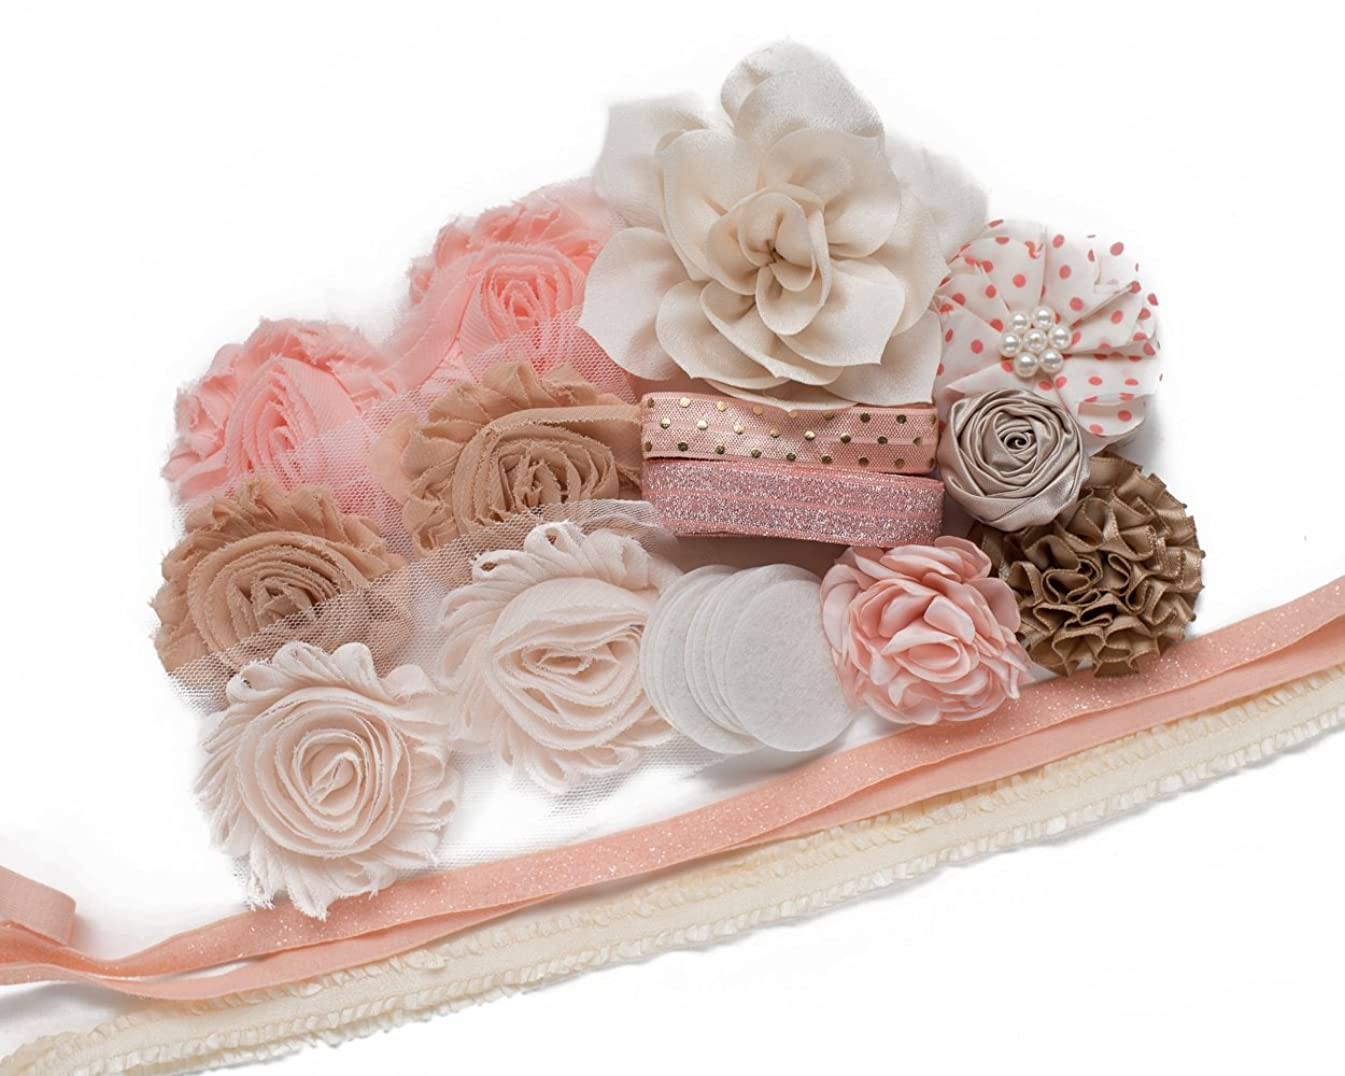 Penelope : DIY Headband Kit - Makes 8 Hair Accessories - Baby - Tween - Gift Making Station - Shabby Chiffon Craft Roses FOE Fold Over Elastic : Princess Parties & Baby Showers